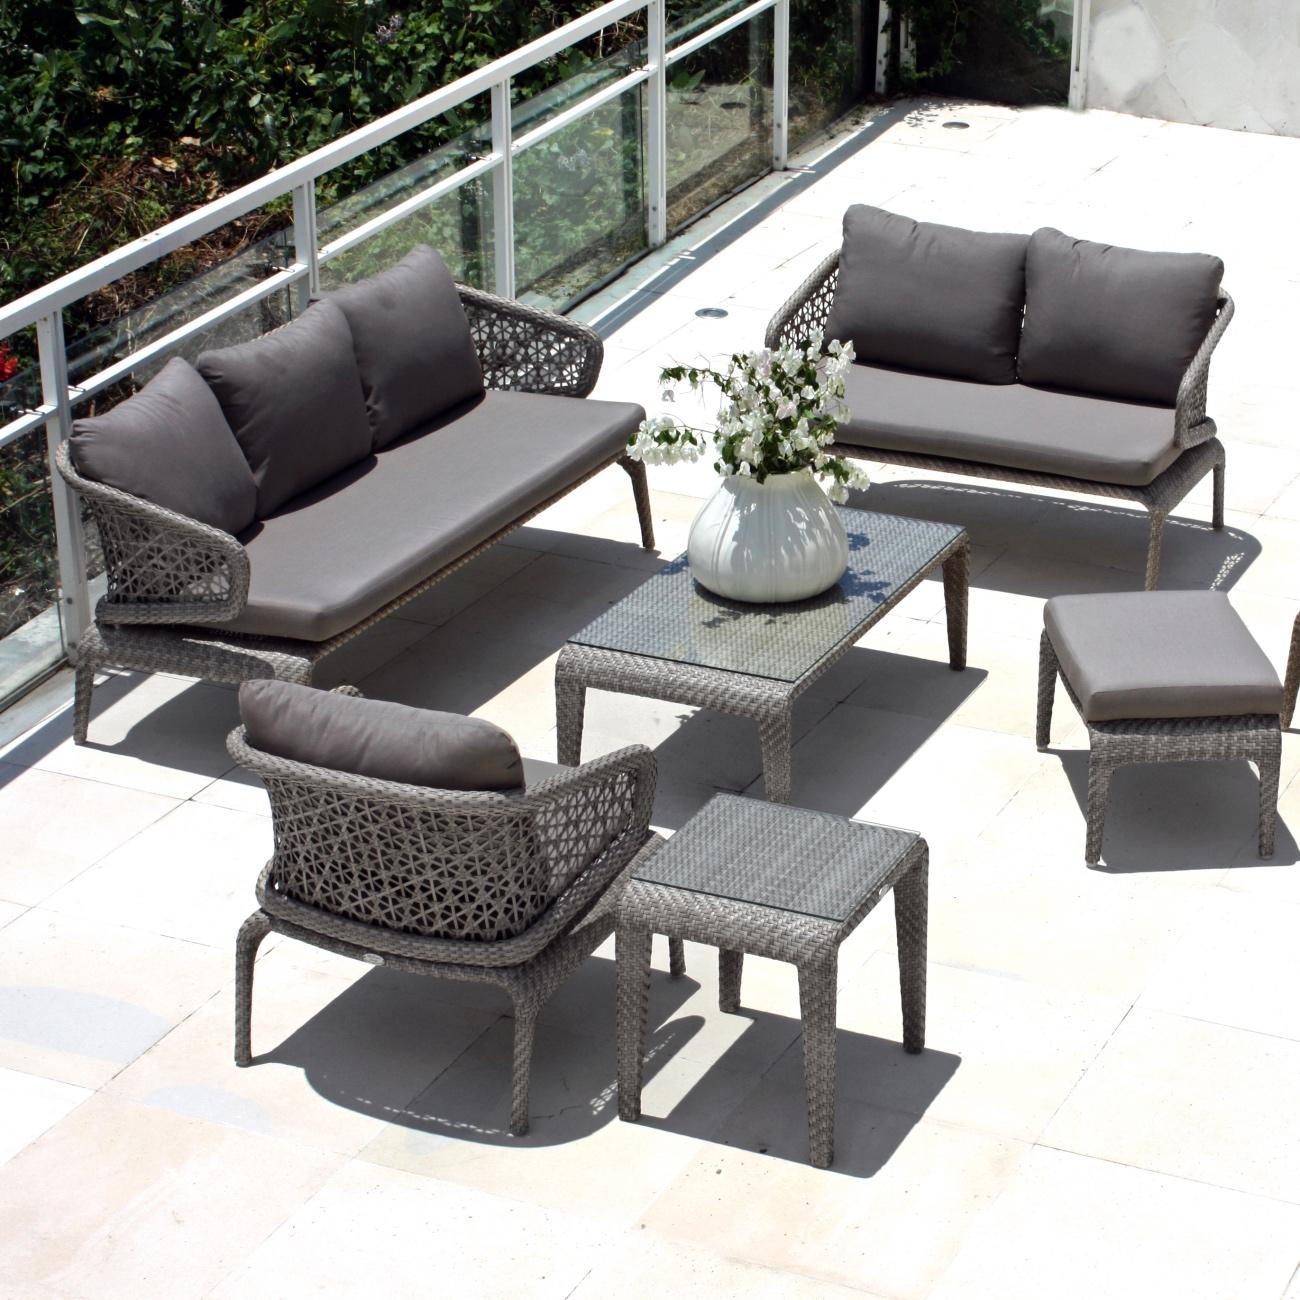 Skyline Journey Love Seat Luxury Outdoor Living